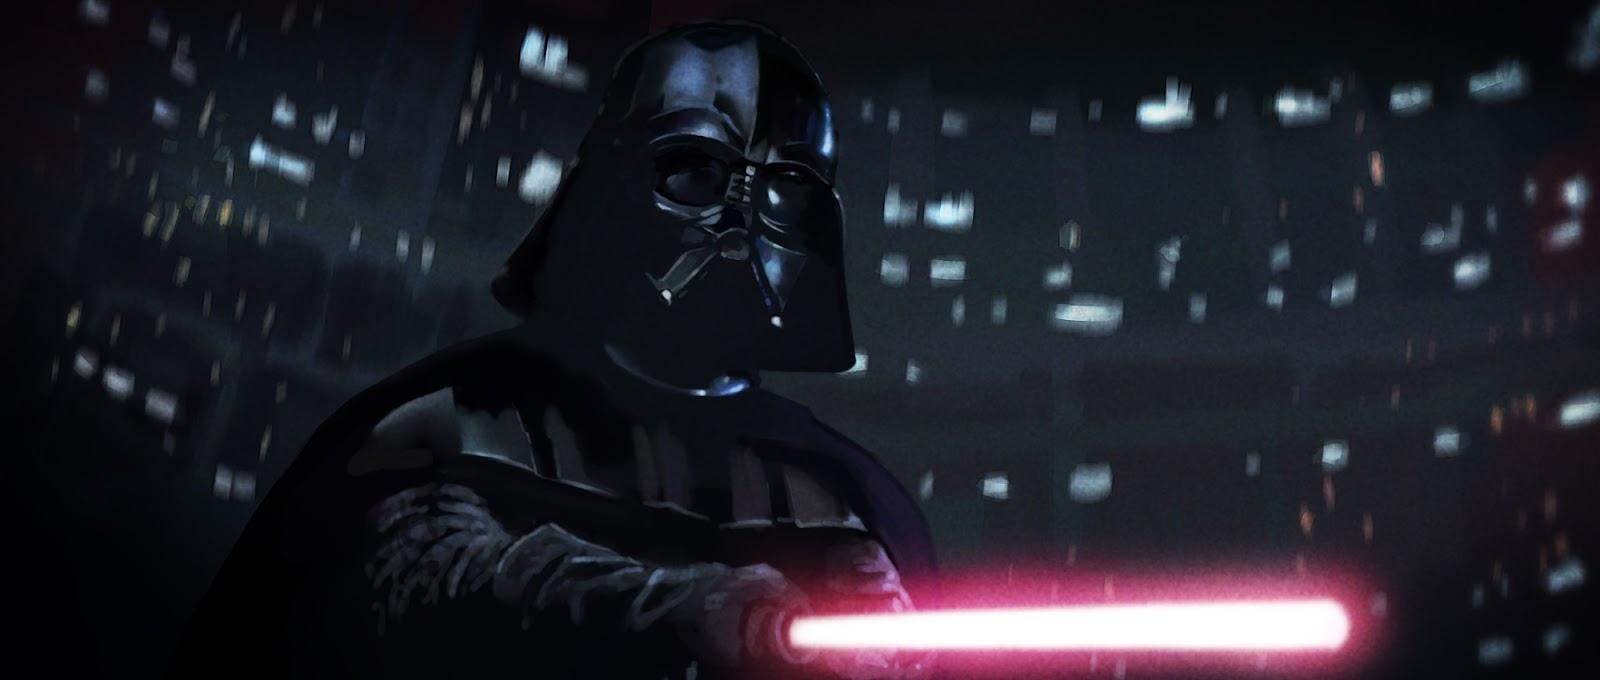 Star Wars V: Empire Strikes Back